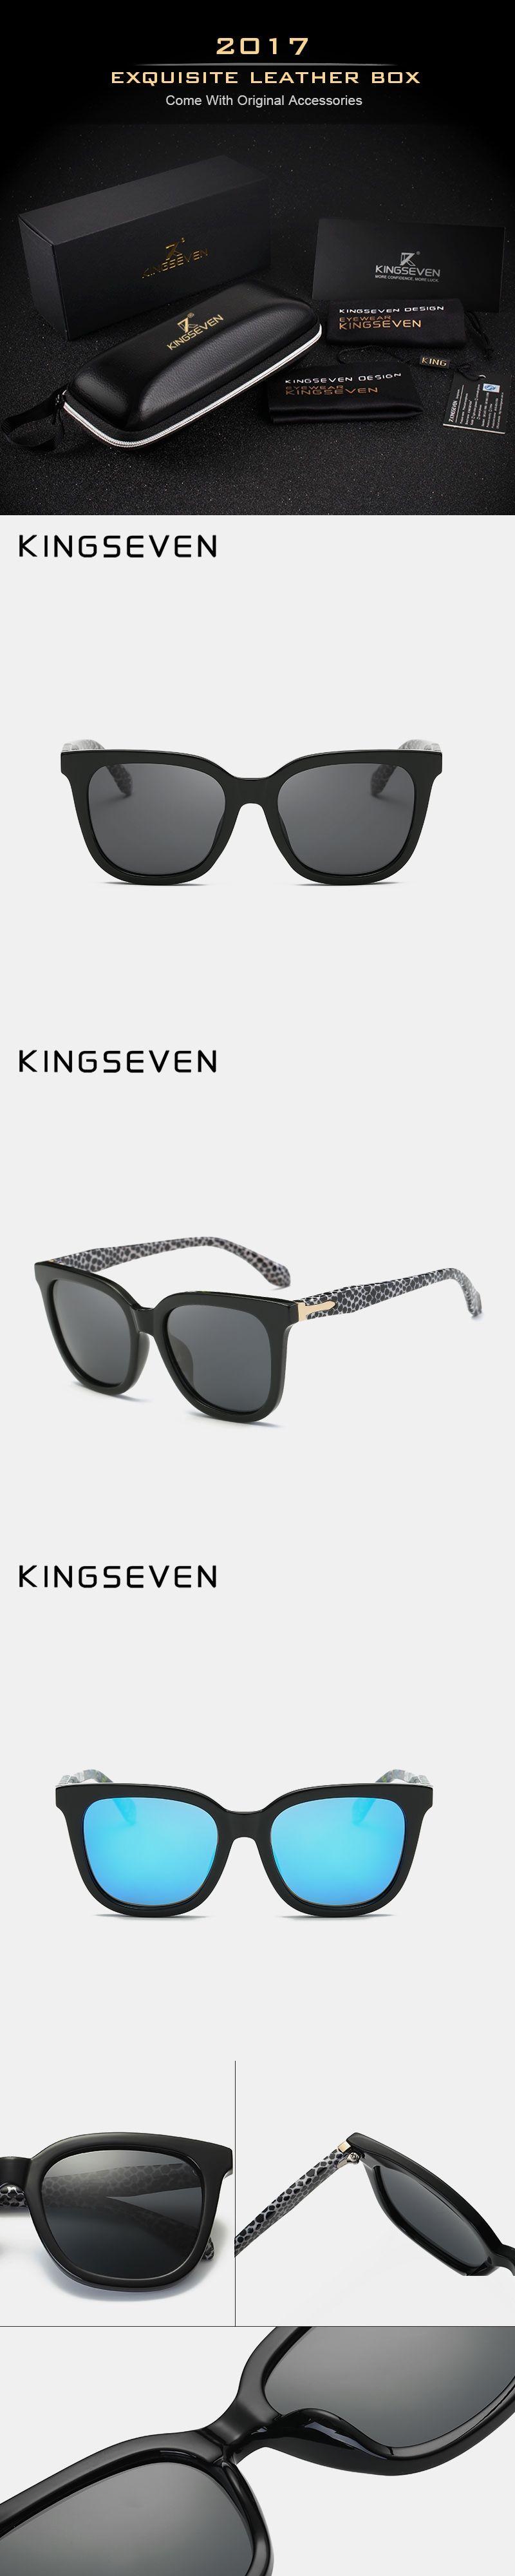 4f46962fcf0a KINGSEVEN olarized Sunglasses Thick Acetate Frame Polaroid Lens Summer  Style Brand Design Sun Glasses